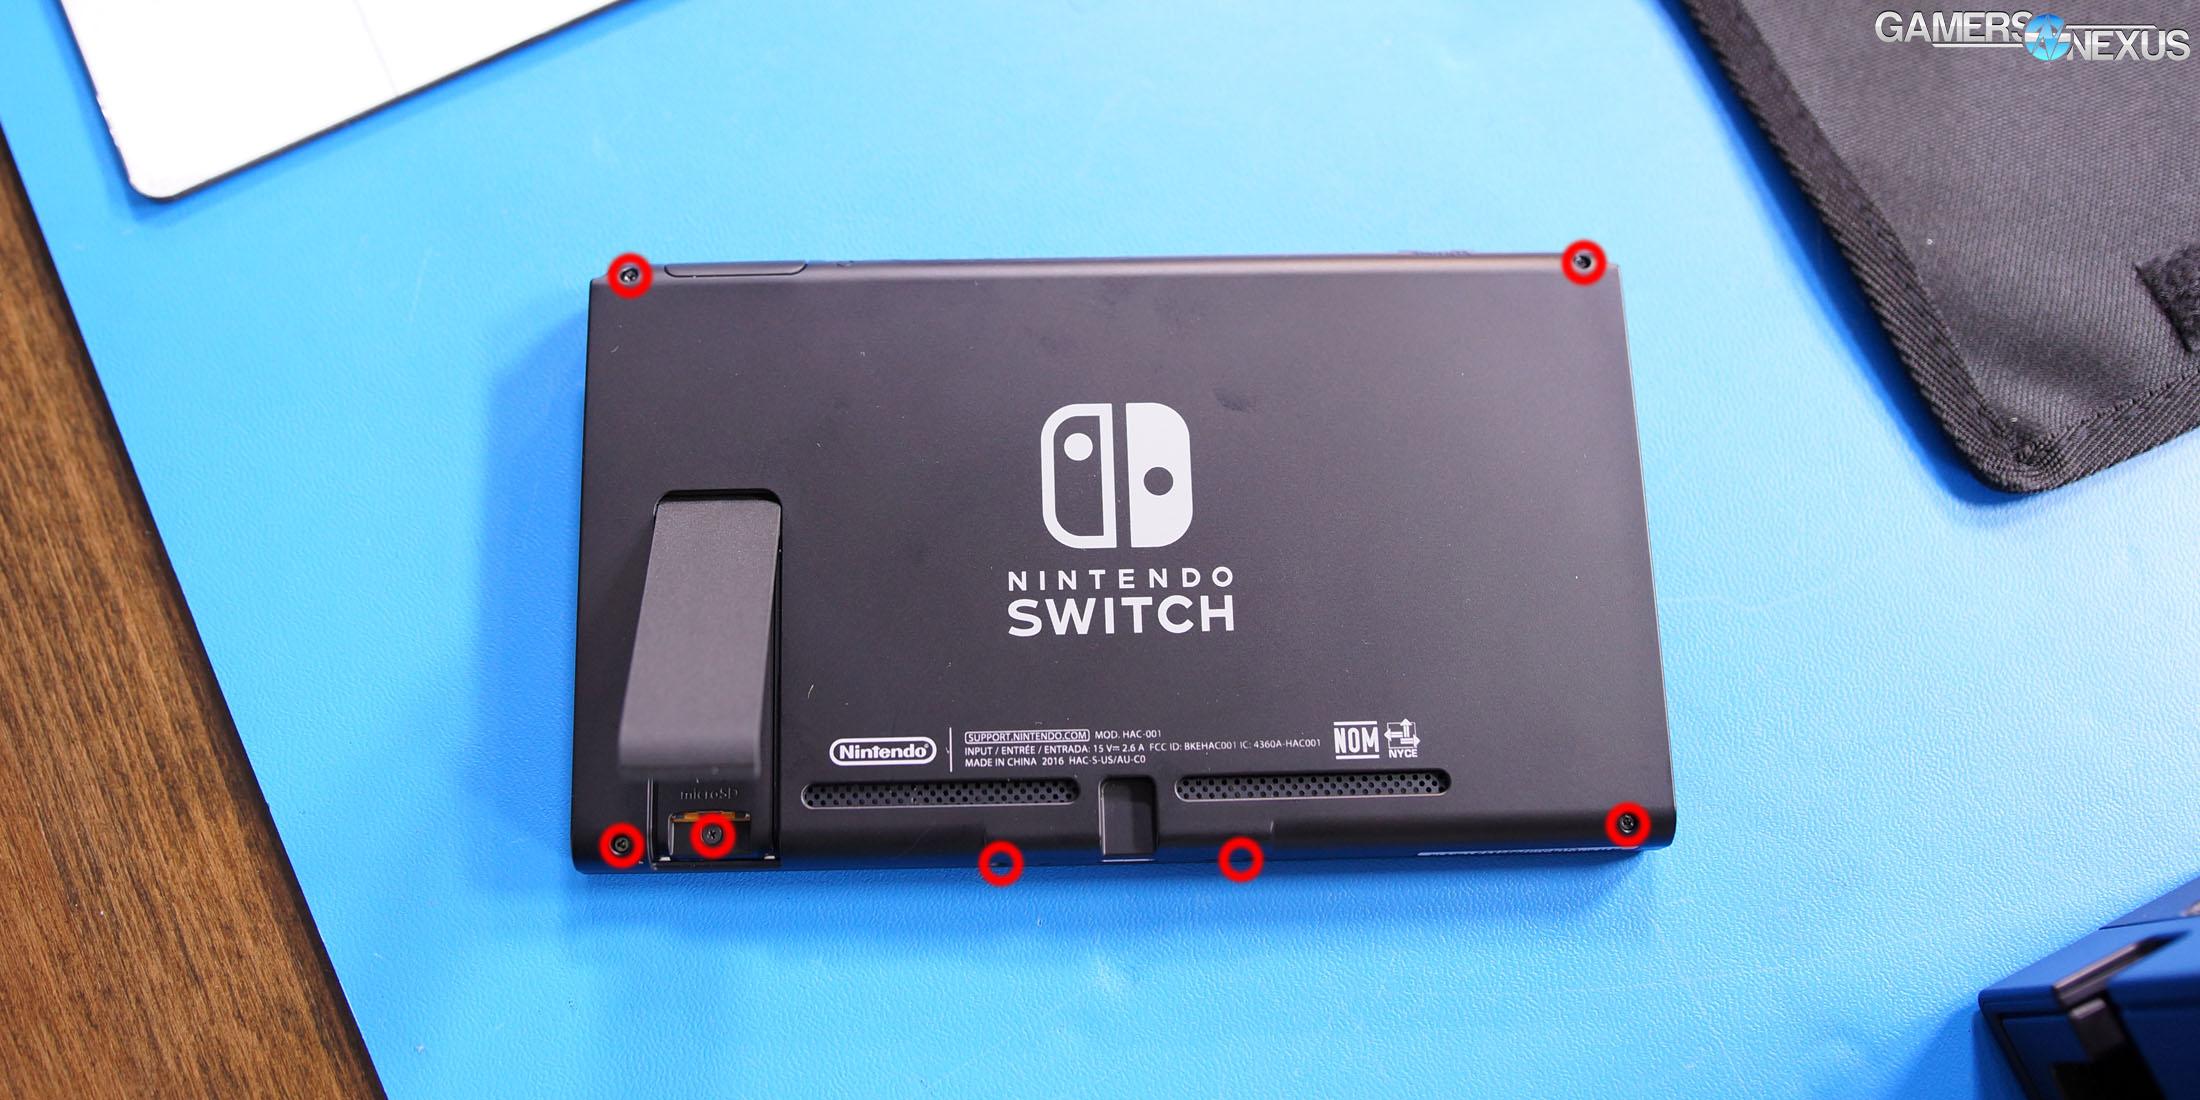 Nintendo Switch Tear-Down & Internal Components